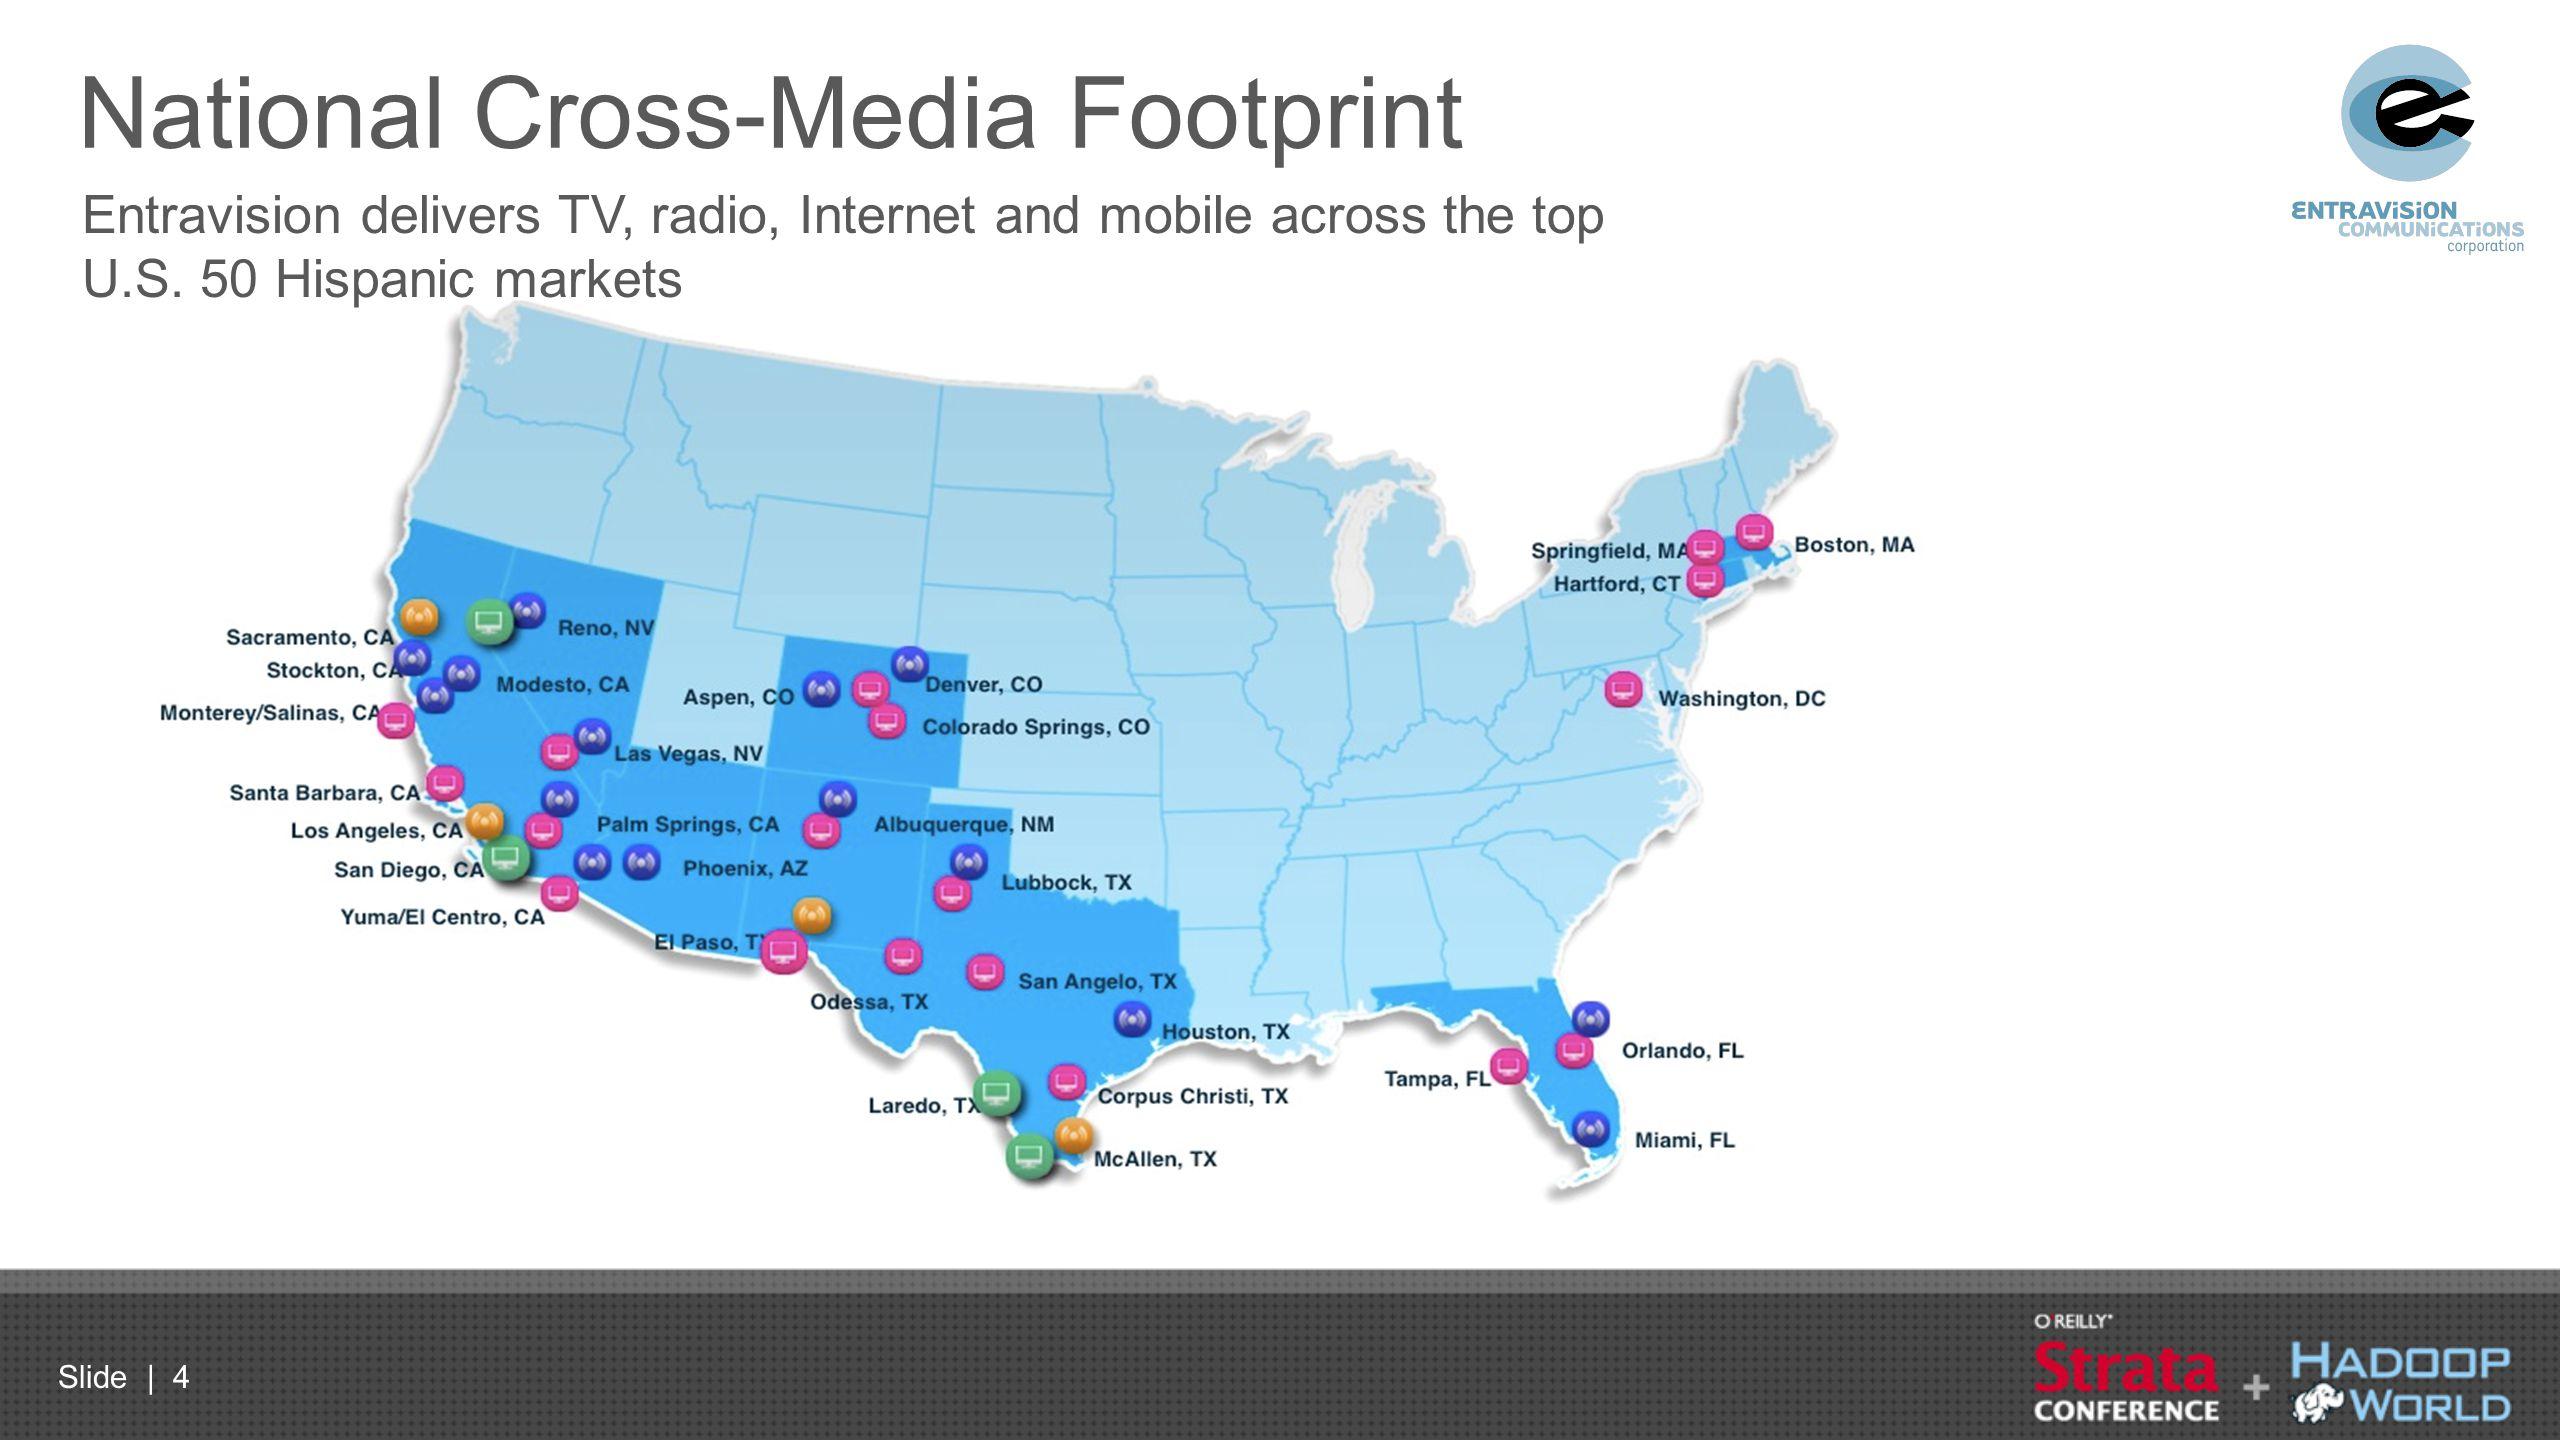 Slide | 4 National Cross-Media Footprint Entravision delivers TV, radio, Internet and mobile across the top U.S. 50 Hispanic markets